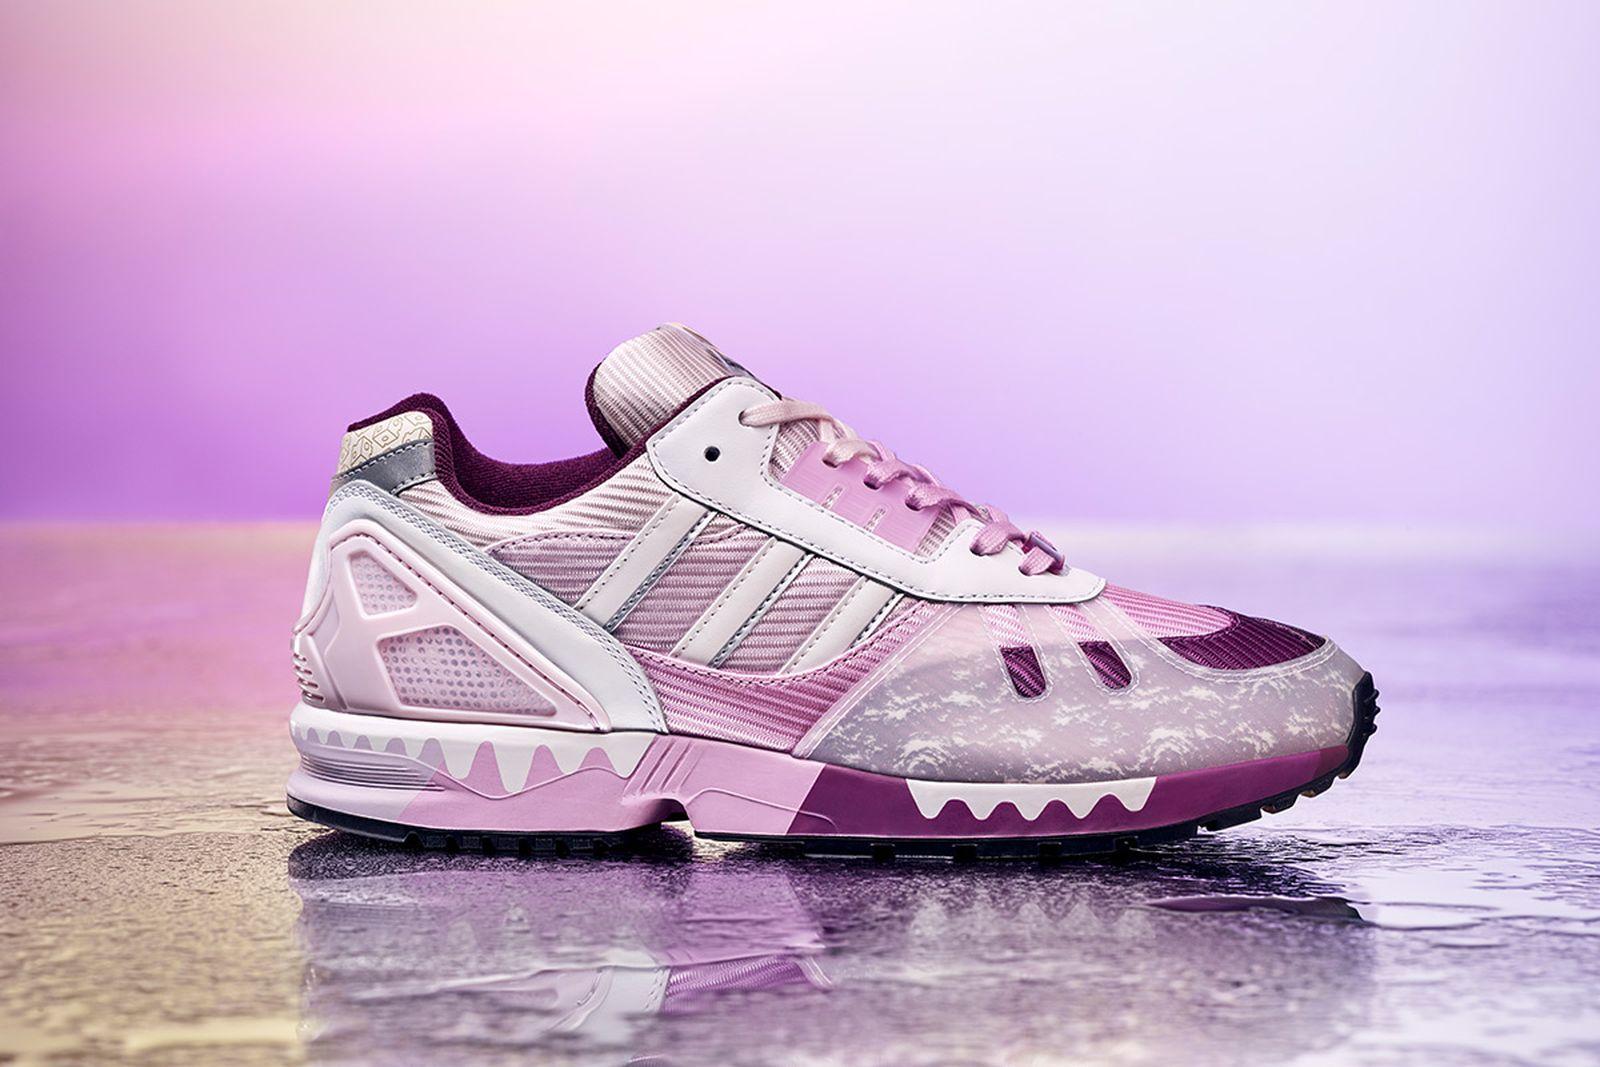 adidas-heytea-zx-7000-release-date-price-02